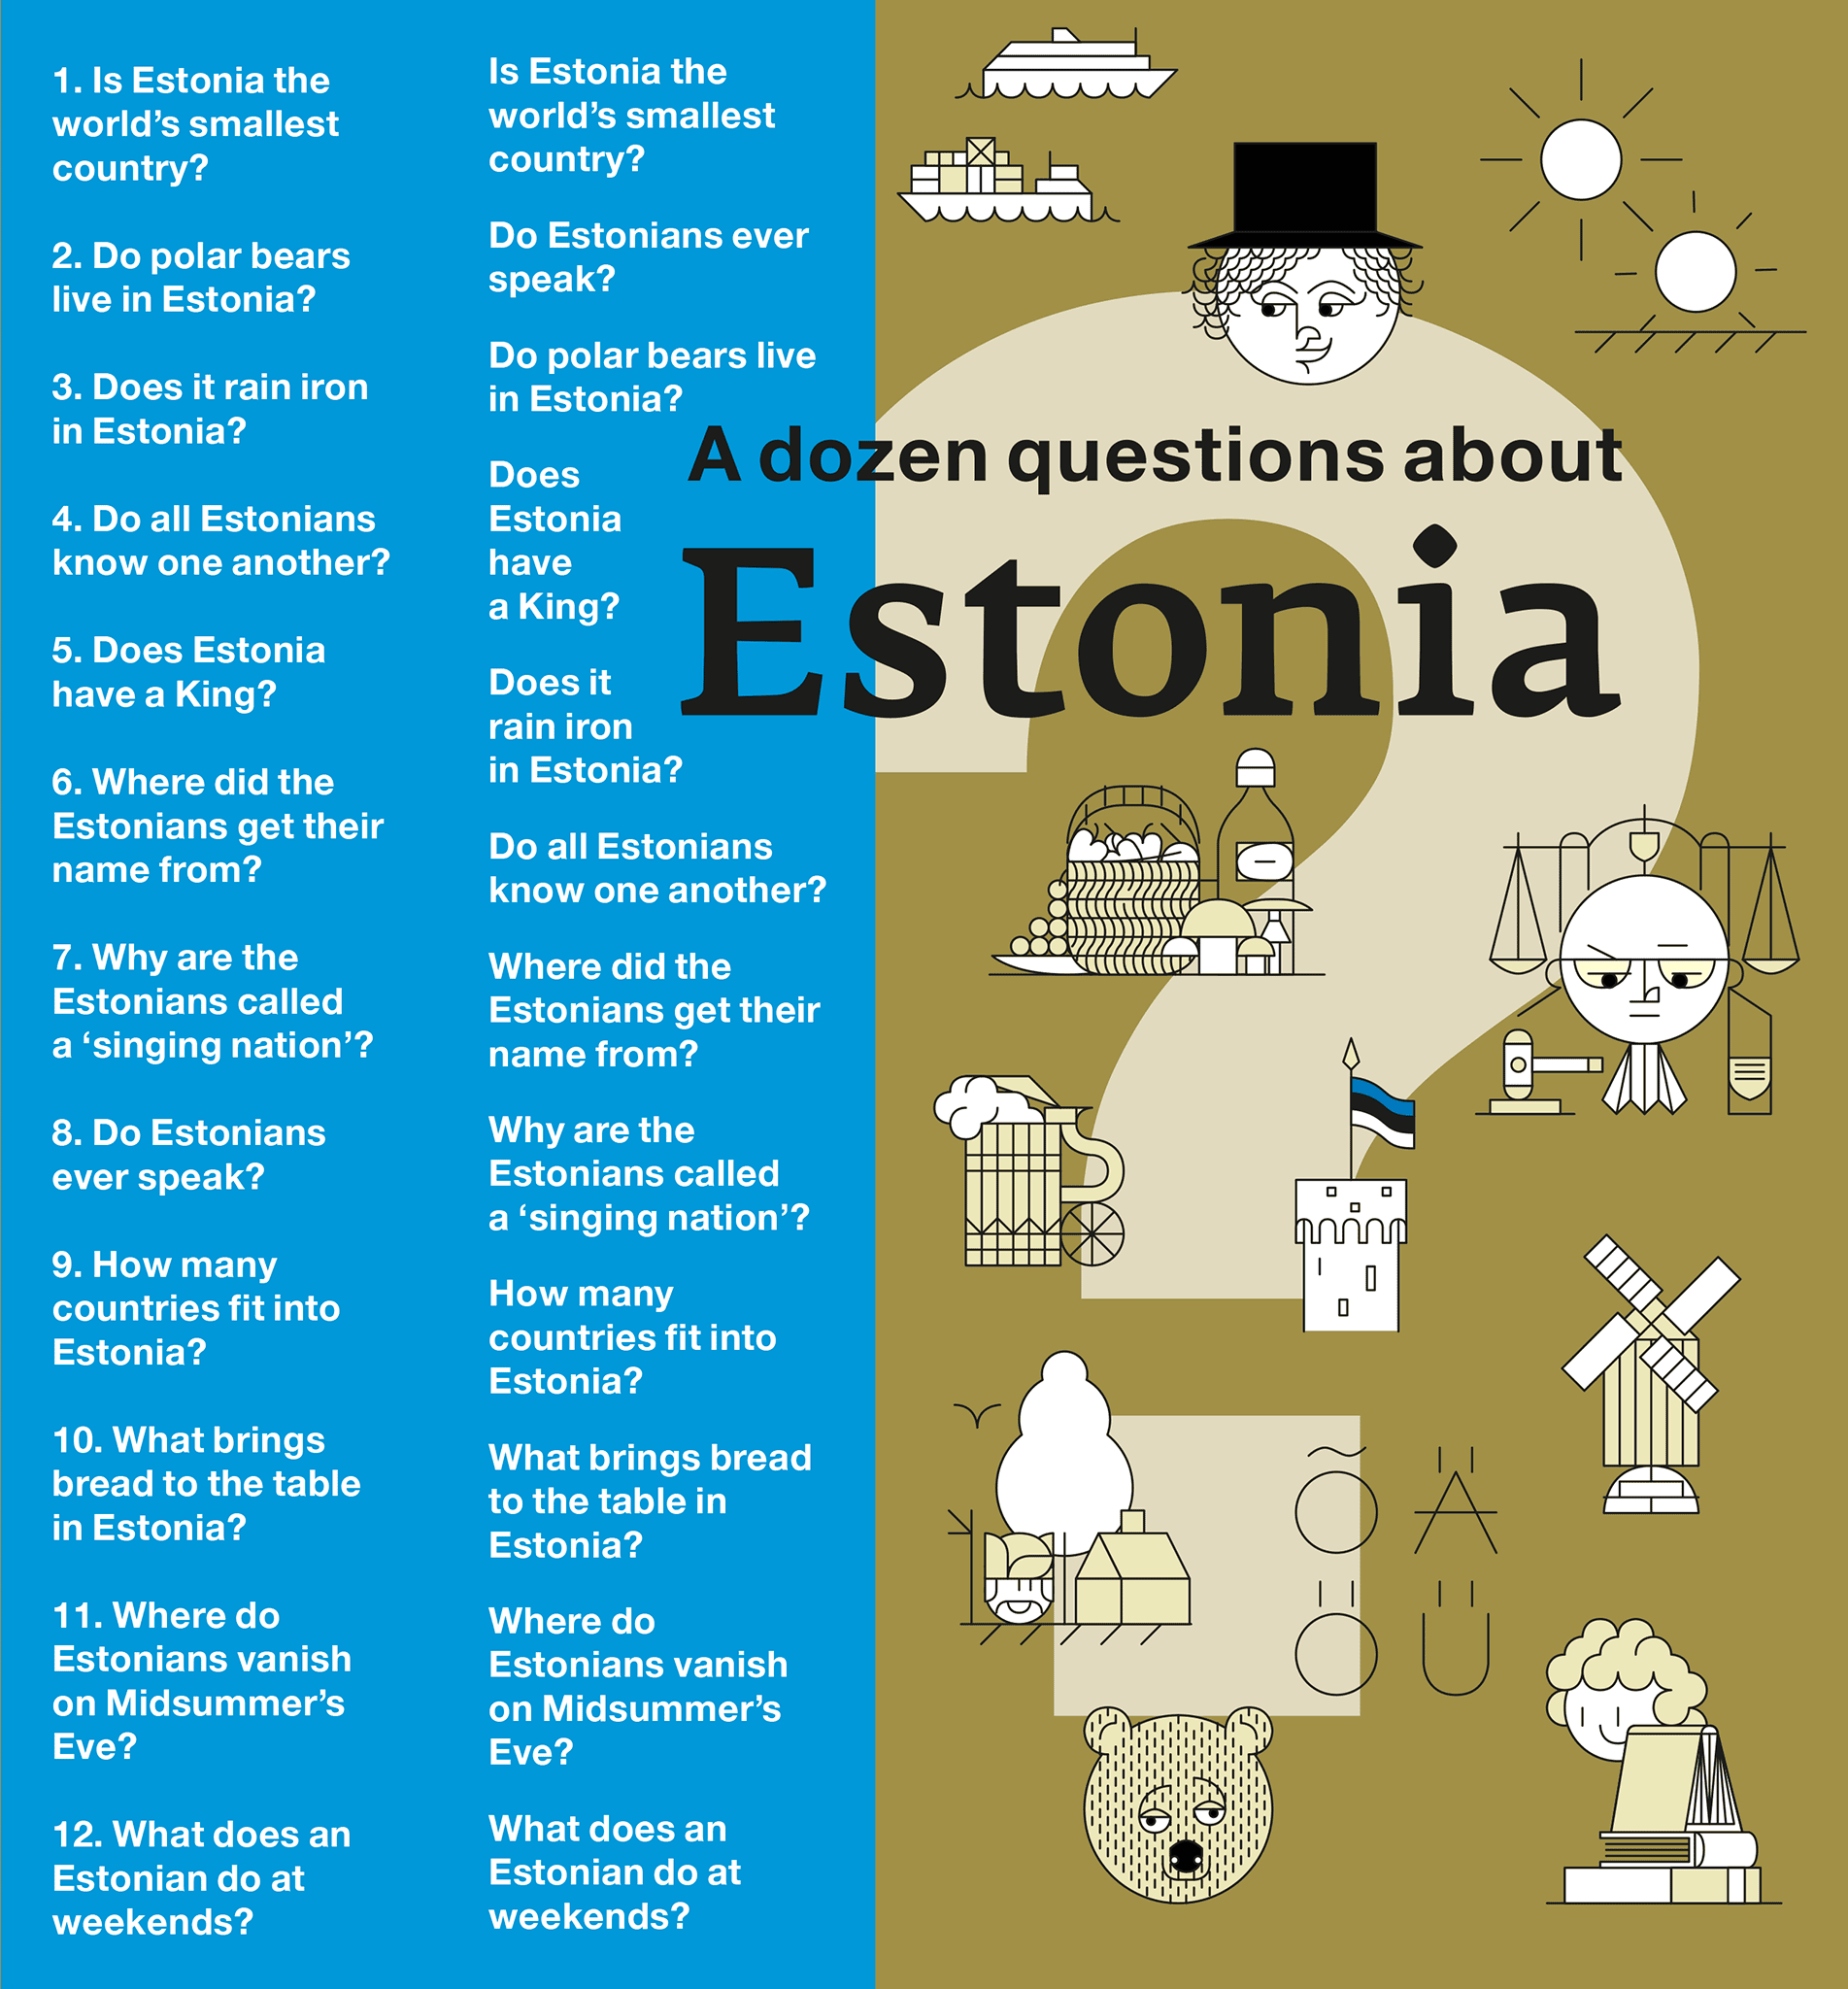 Kaksitoista kysymysta Virosta